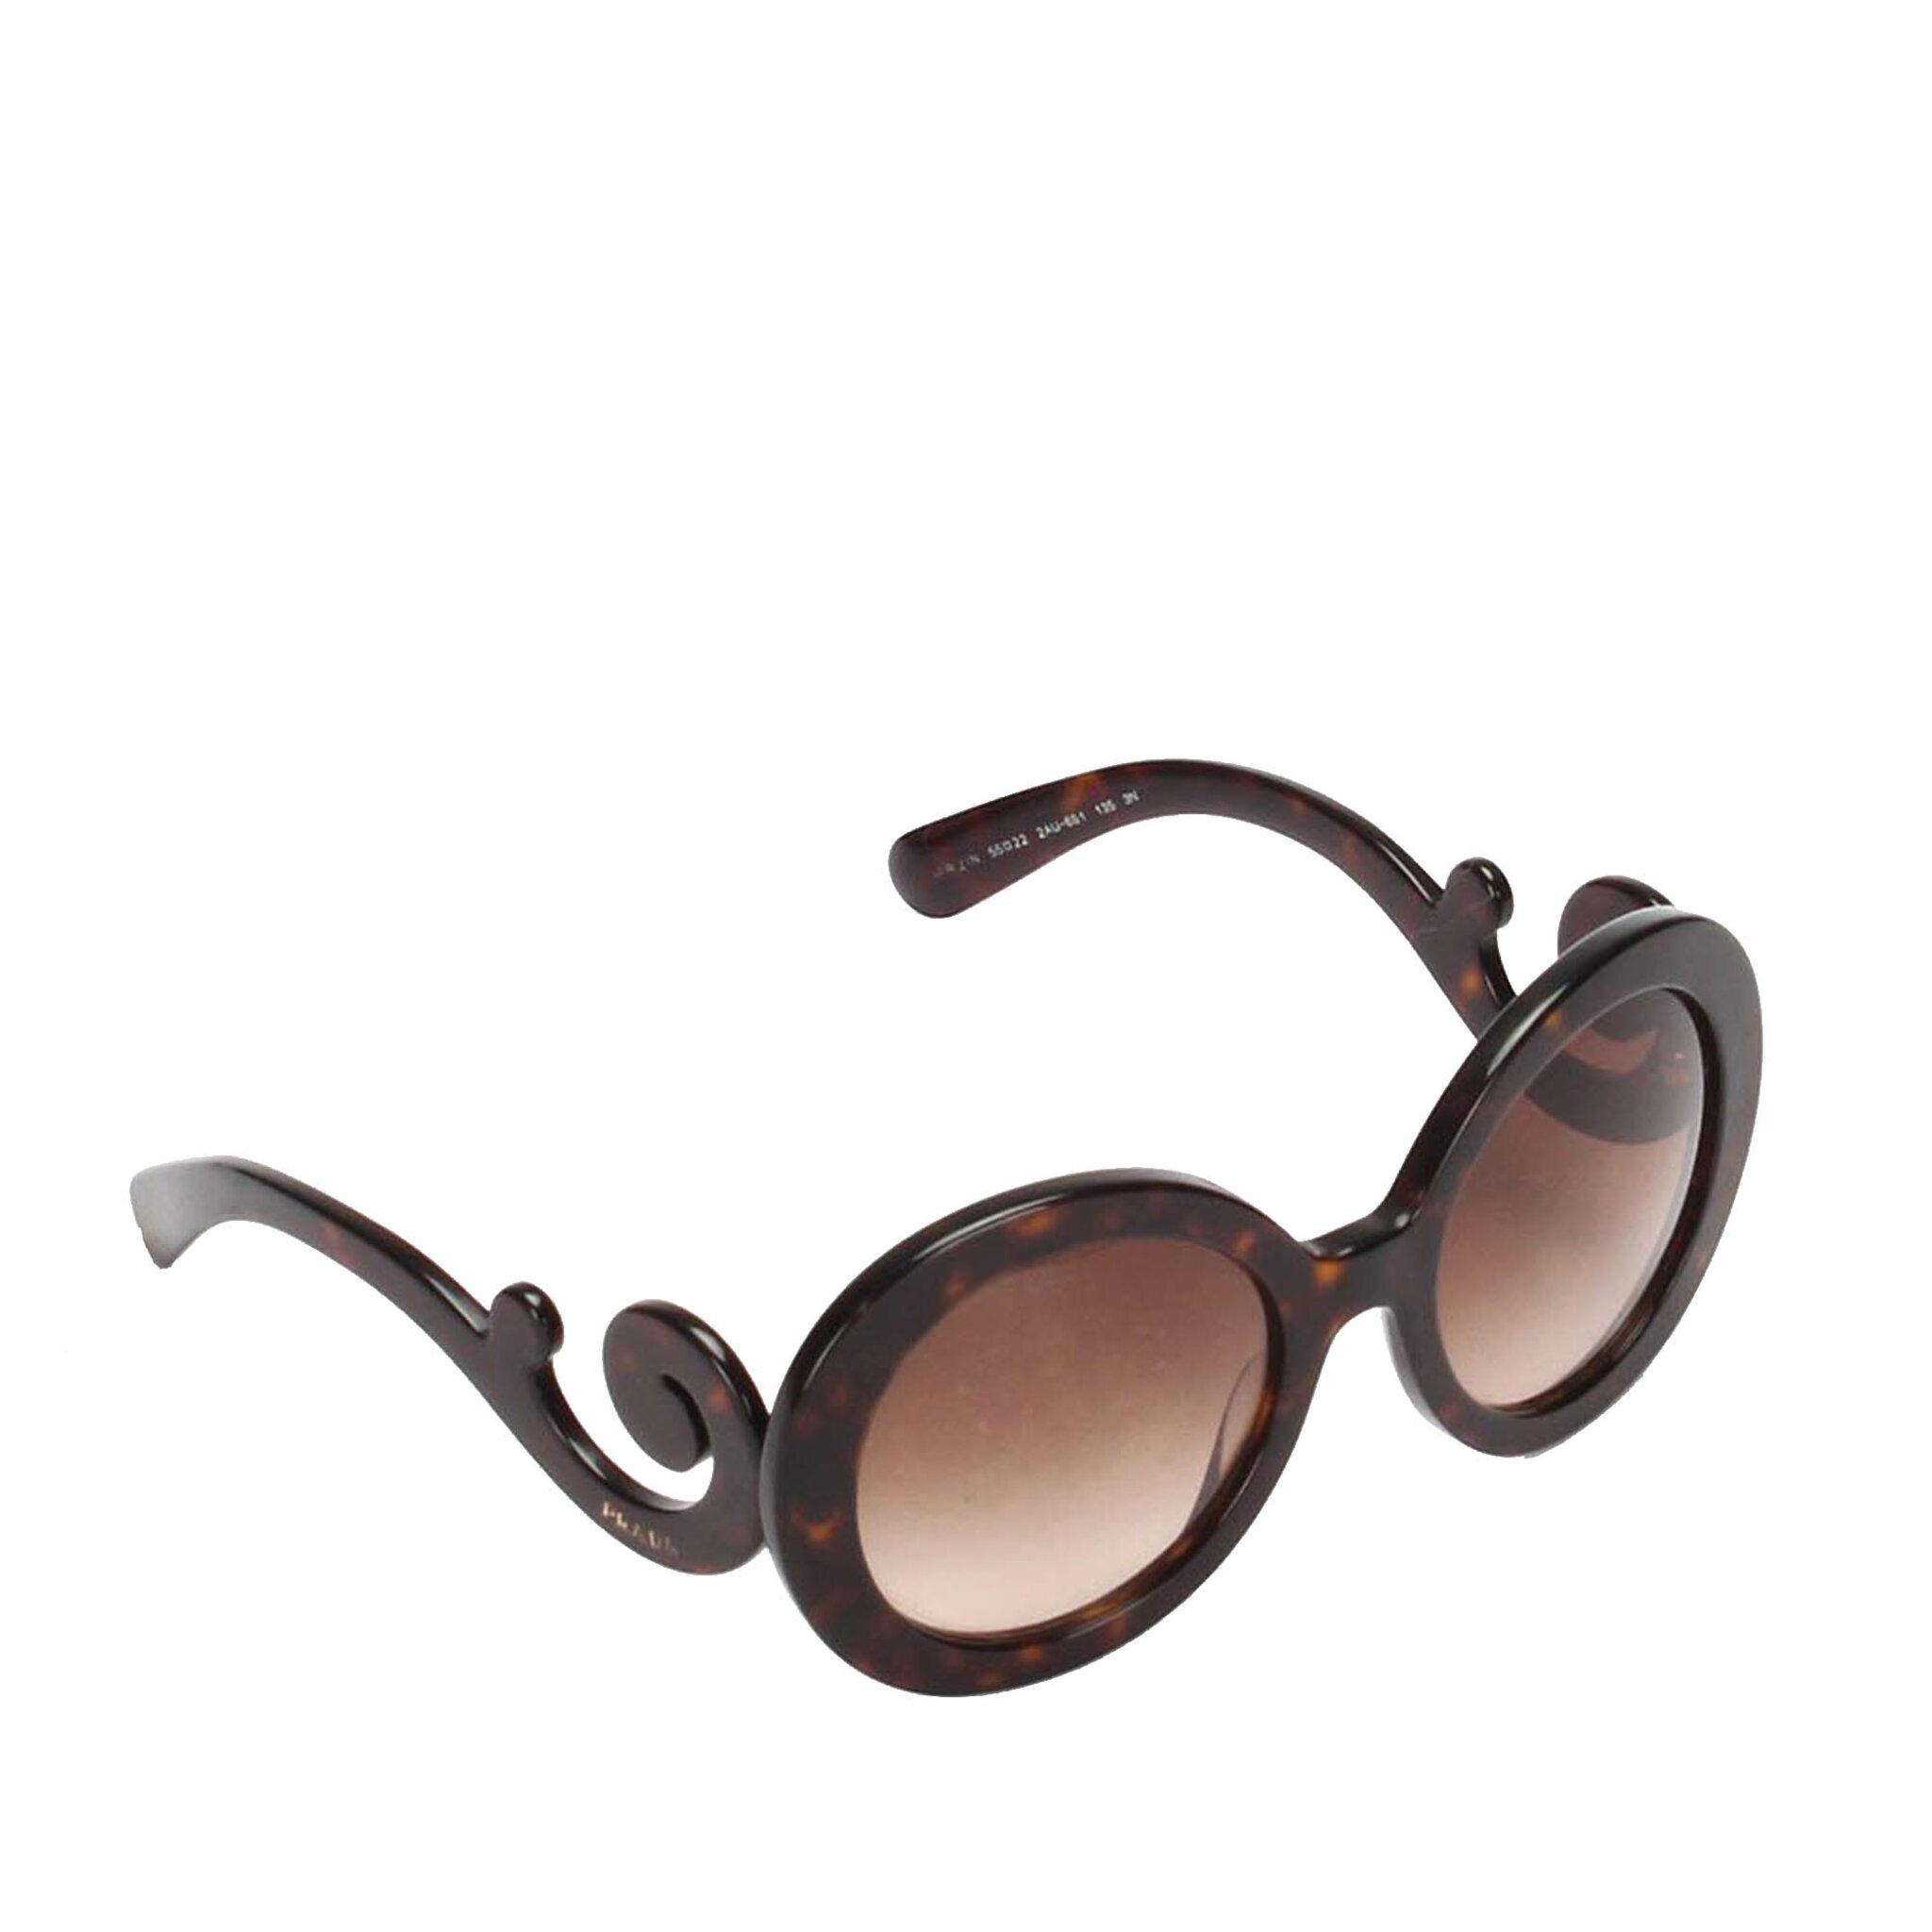 Prada Baroque Round Sunglasses, ONESIZE